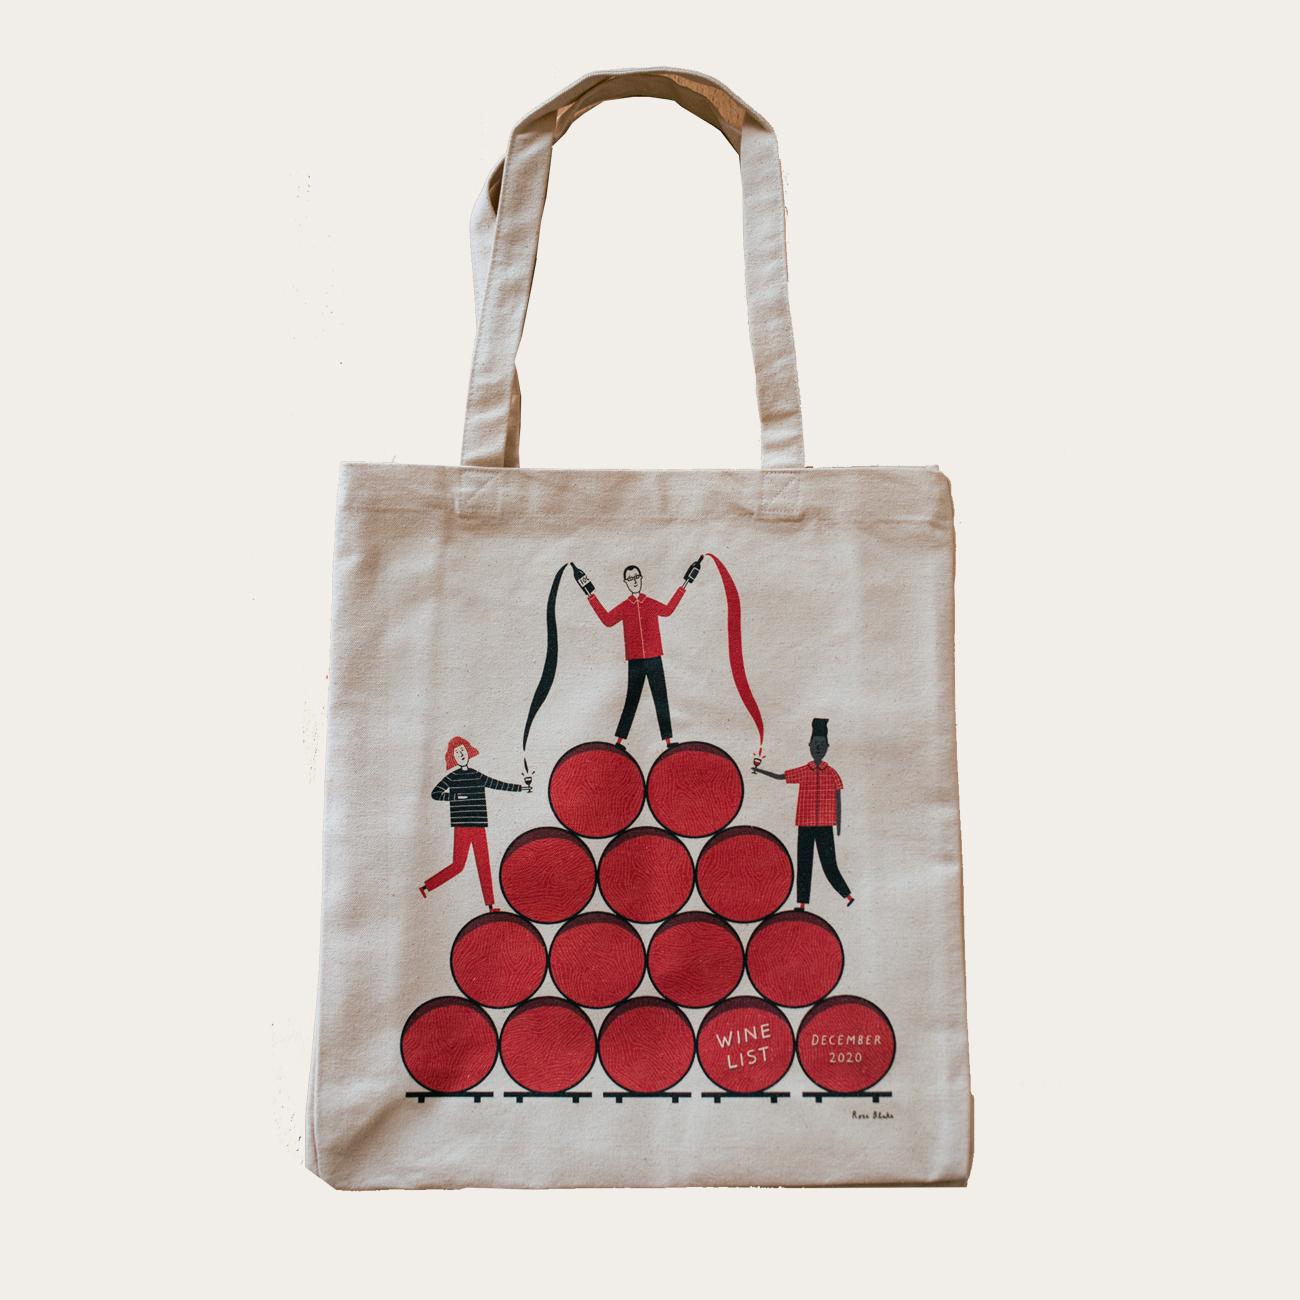 Rose Blake x Wine List Tote Bag